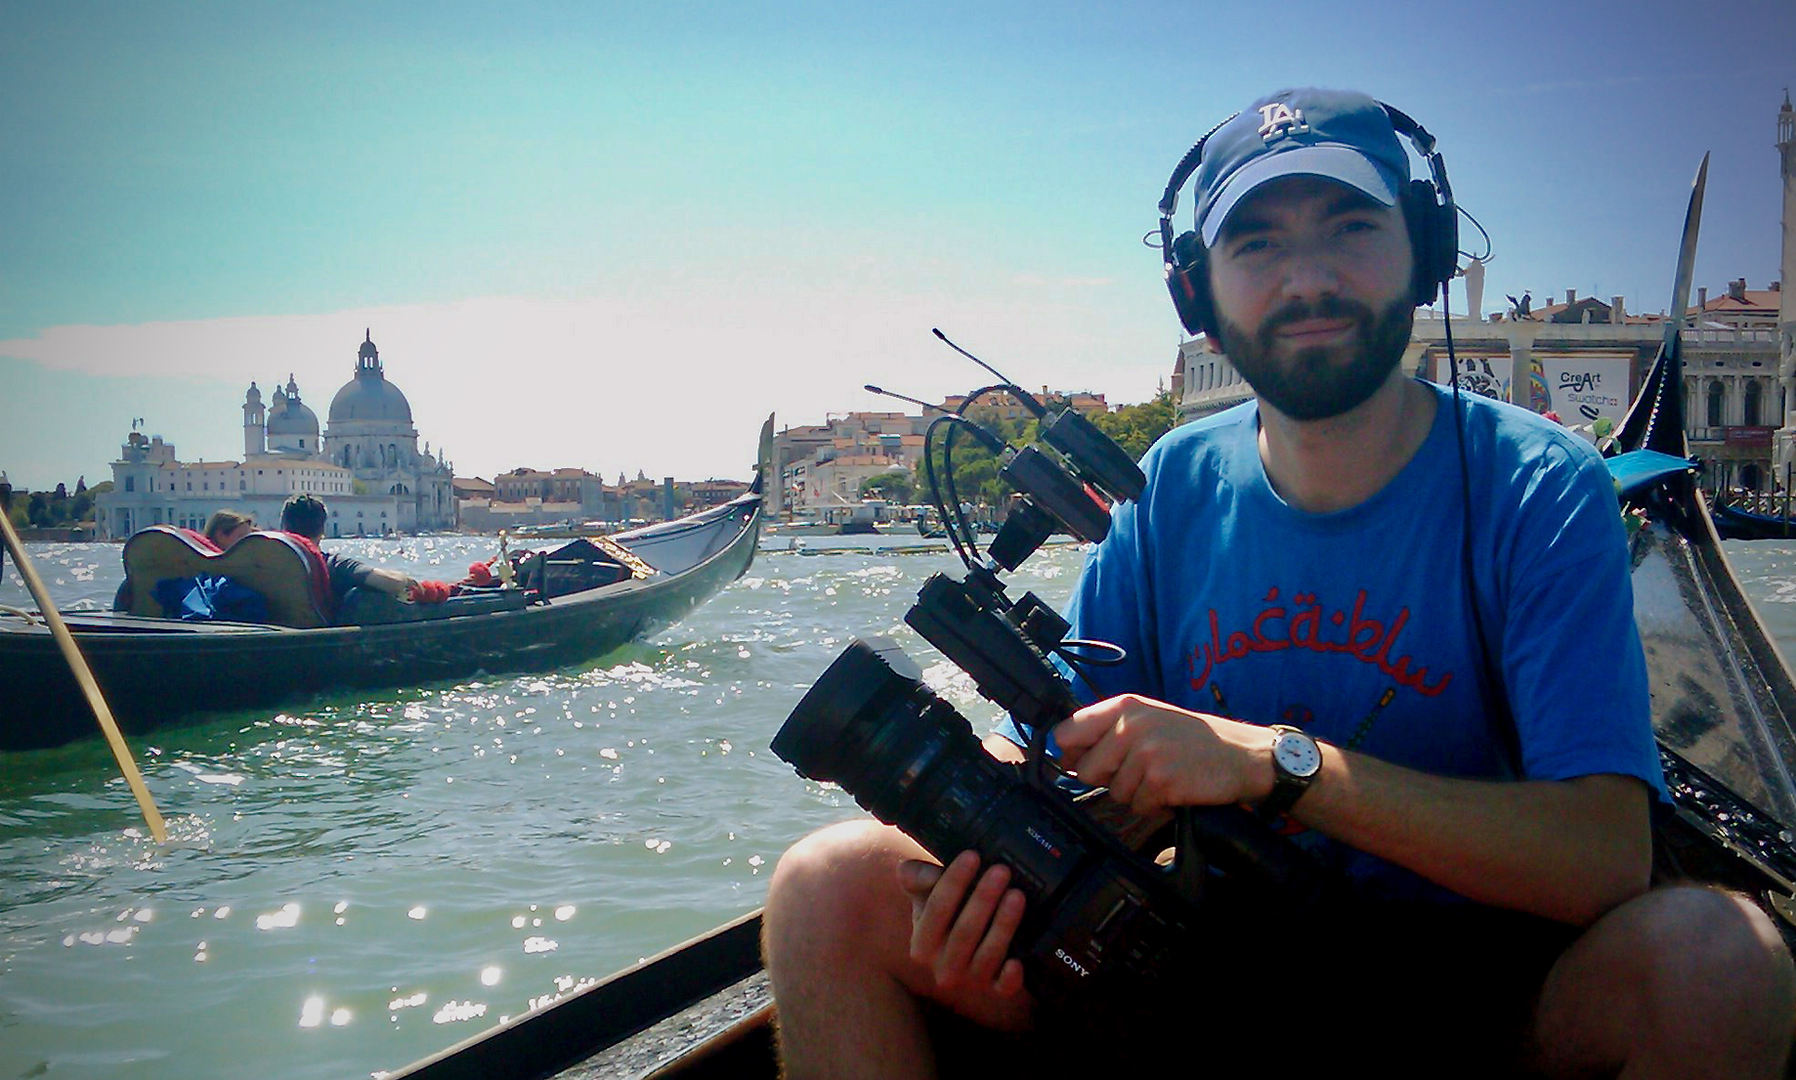 Venice, Italy - corporate